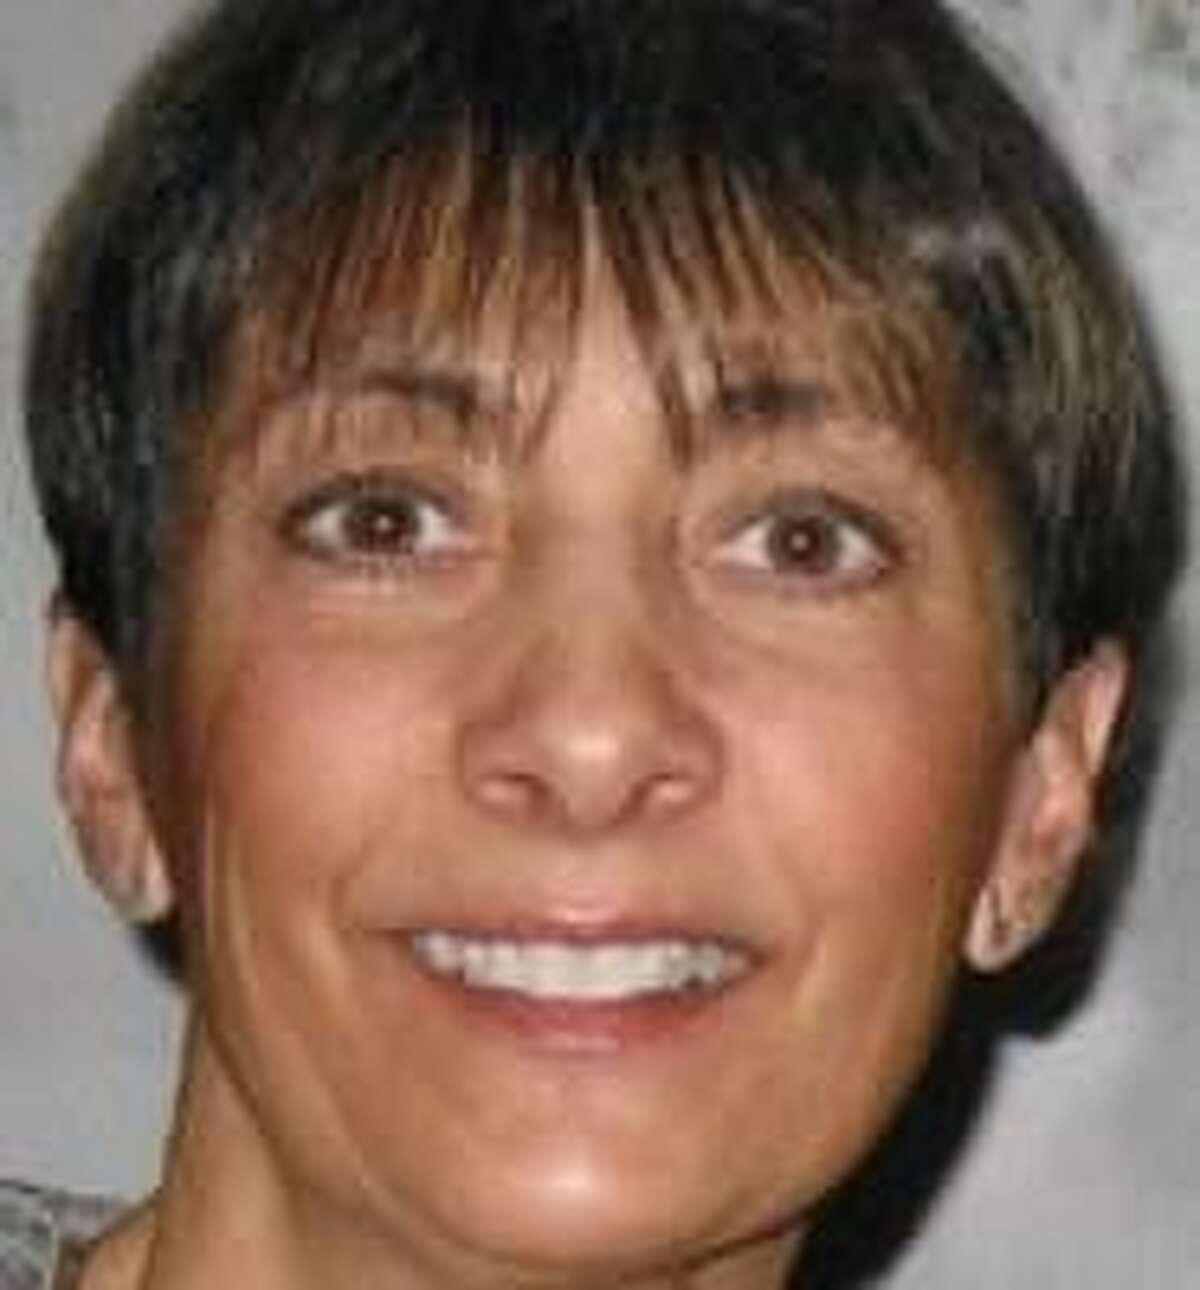 Deanna Marie Herlihy ran the pre-preschool program, Curiosity Corner, for 20 years.